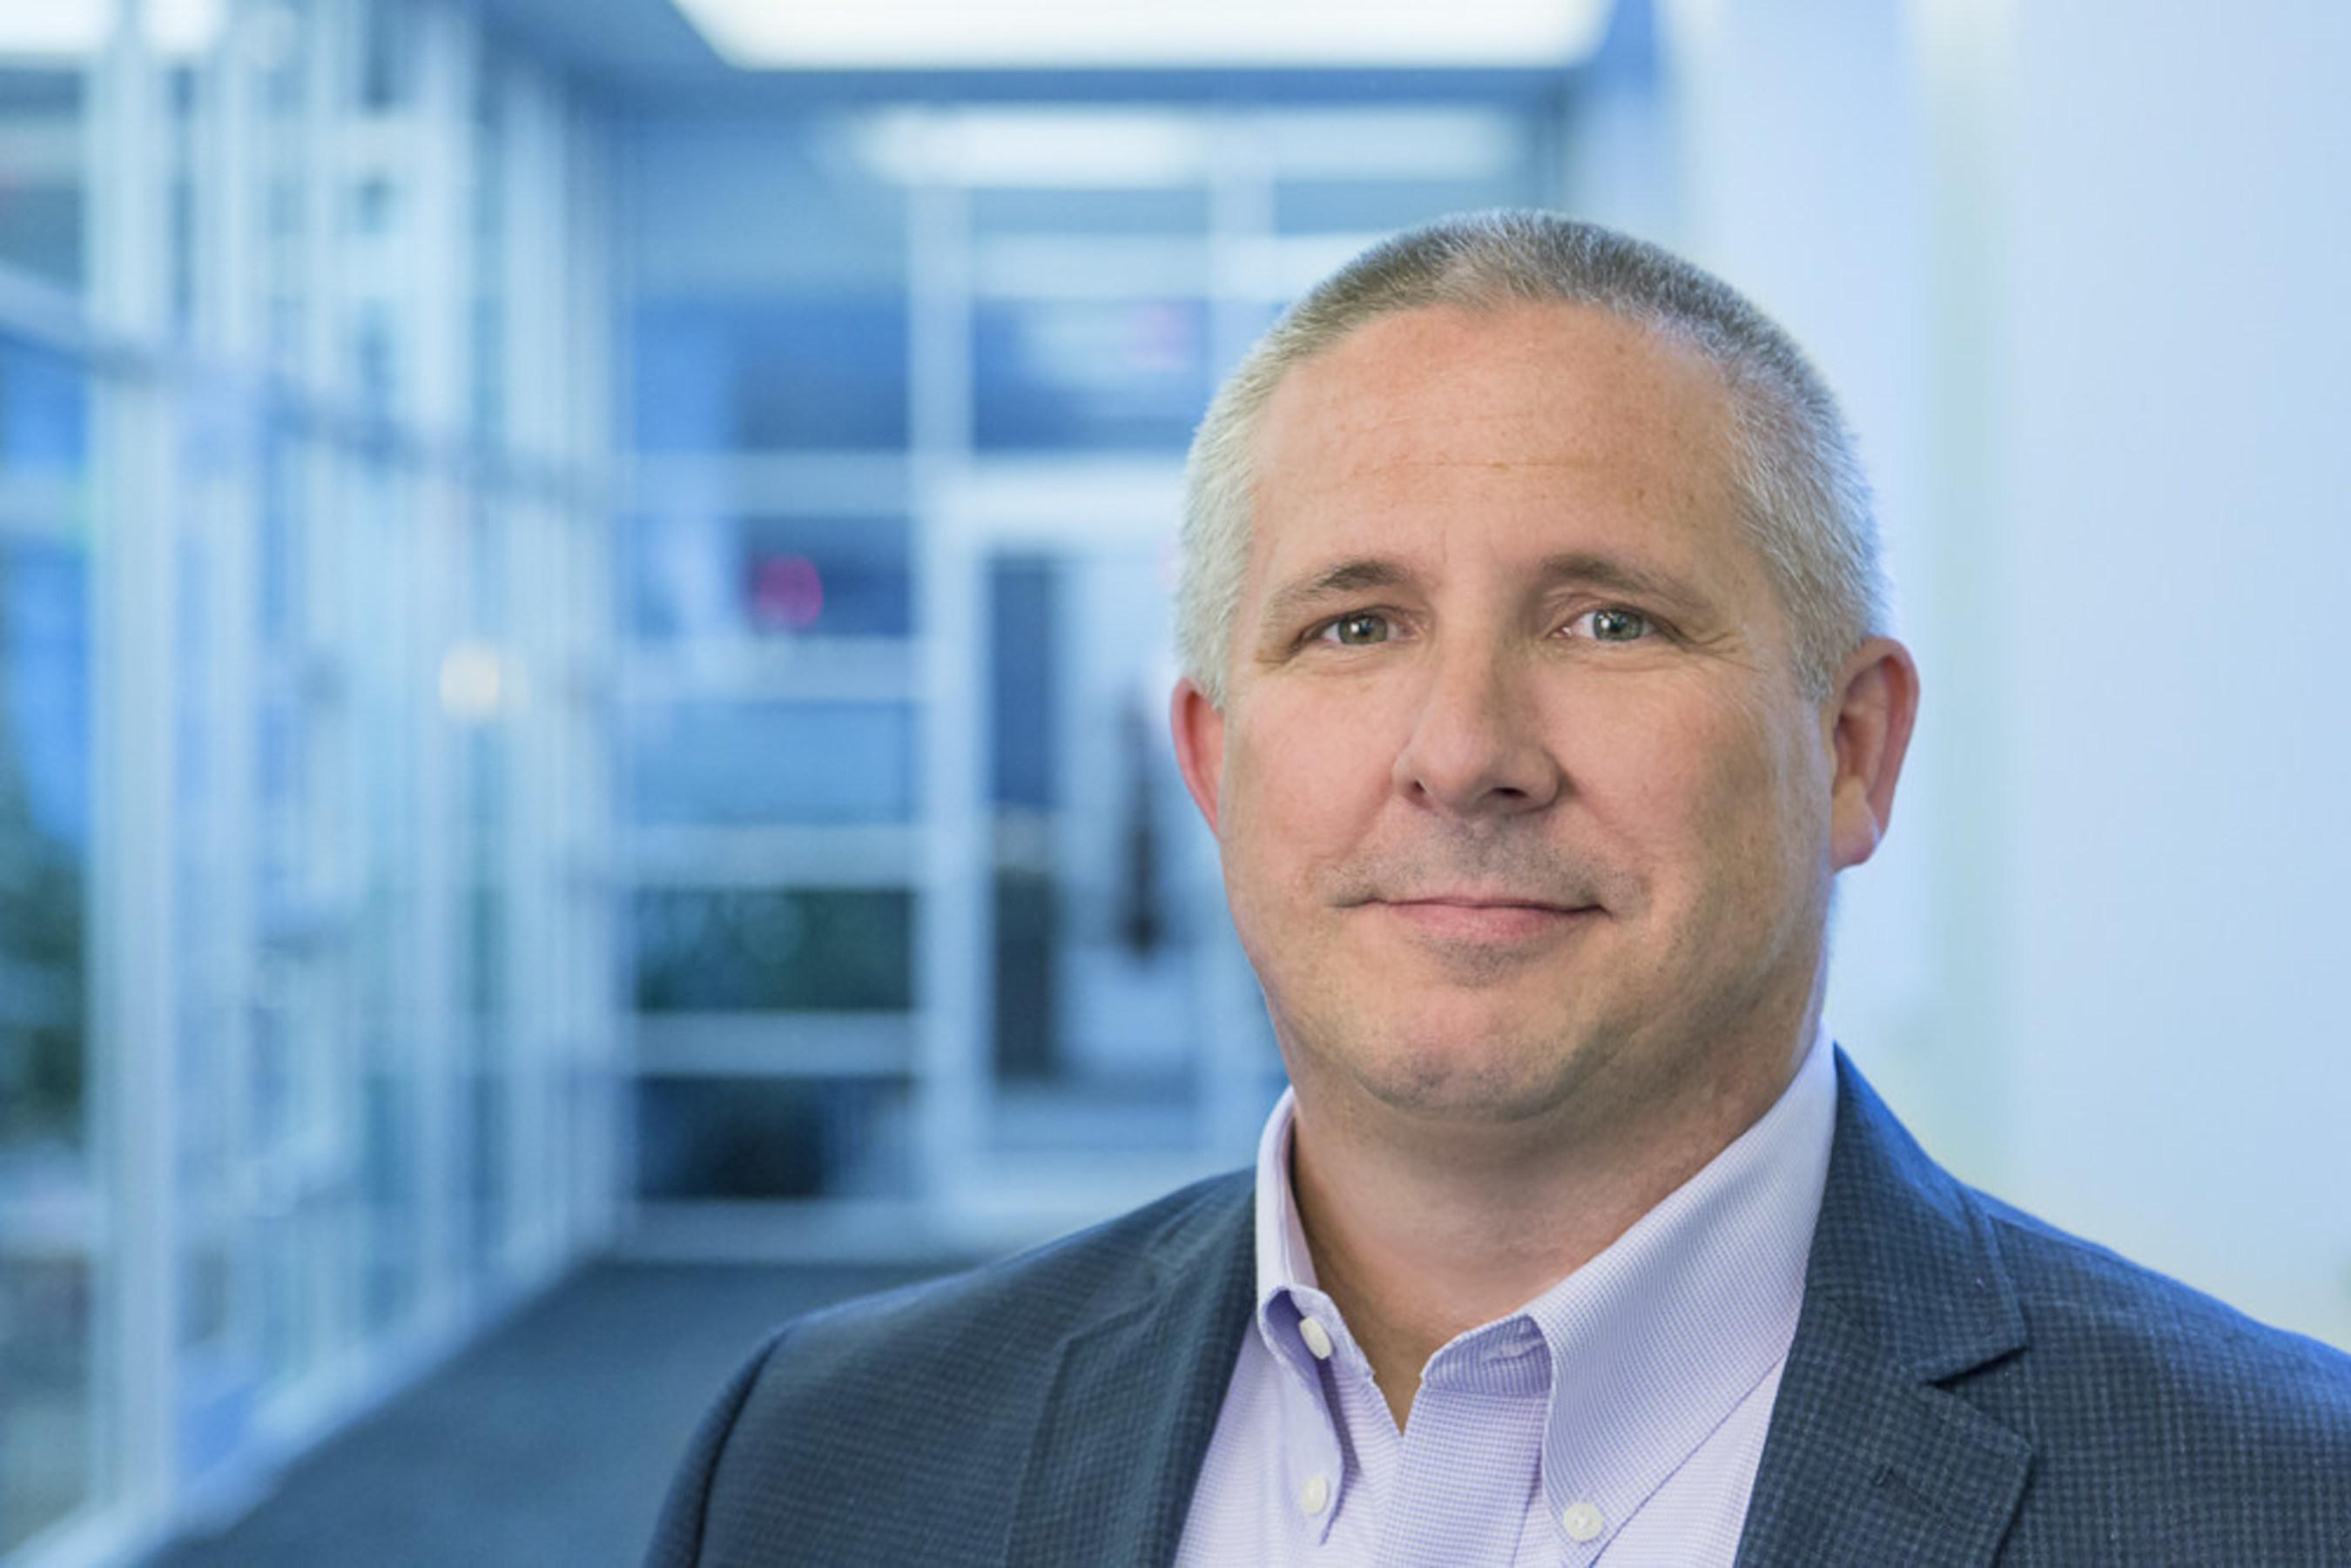 Brad Kirkpatrick, Chief Client Officer, WebMD Health Services